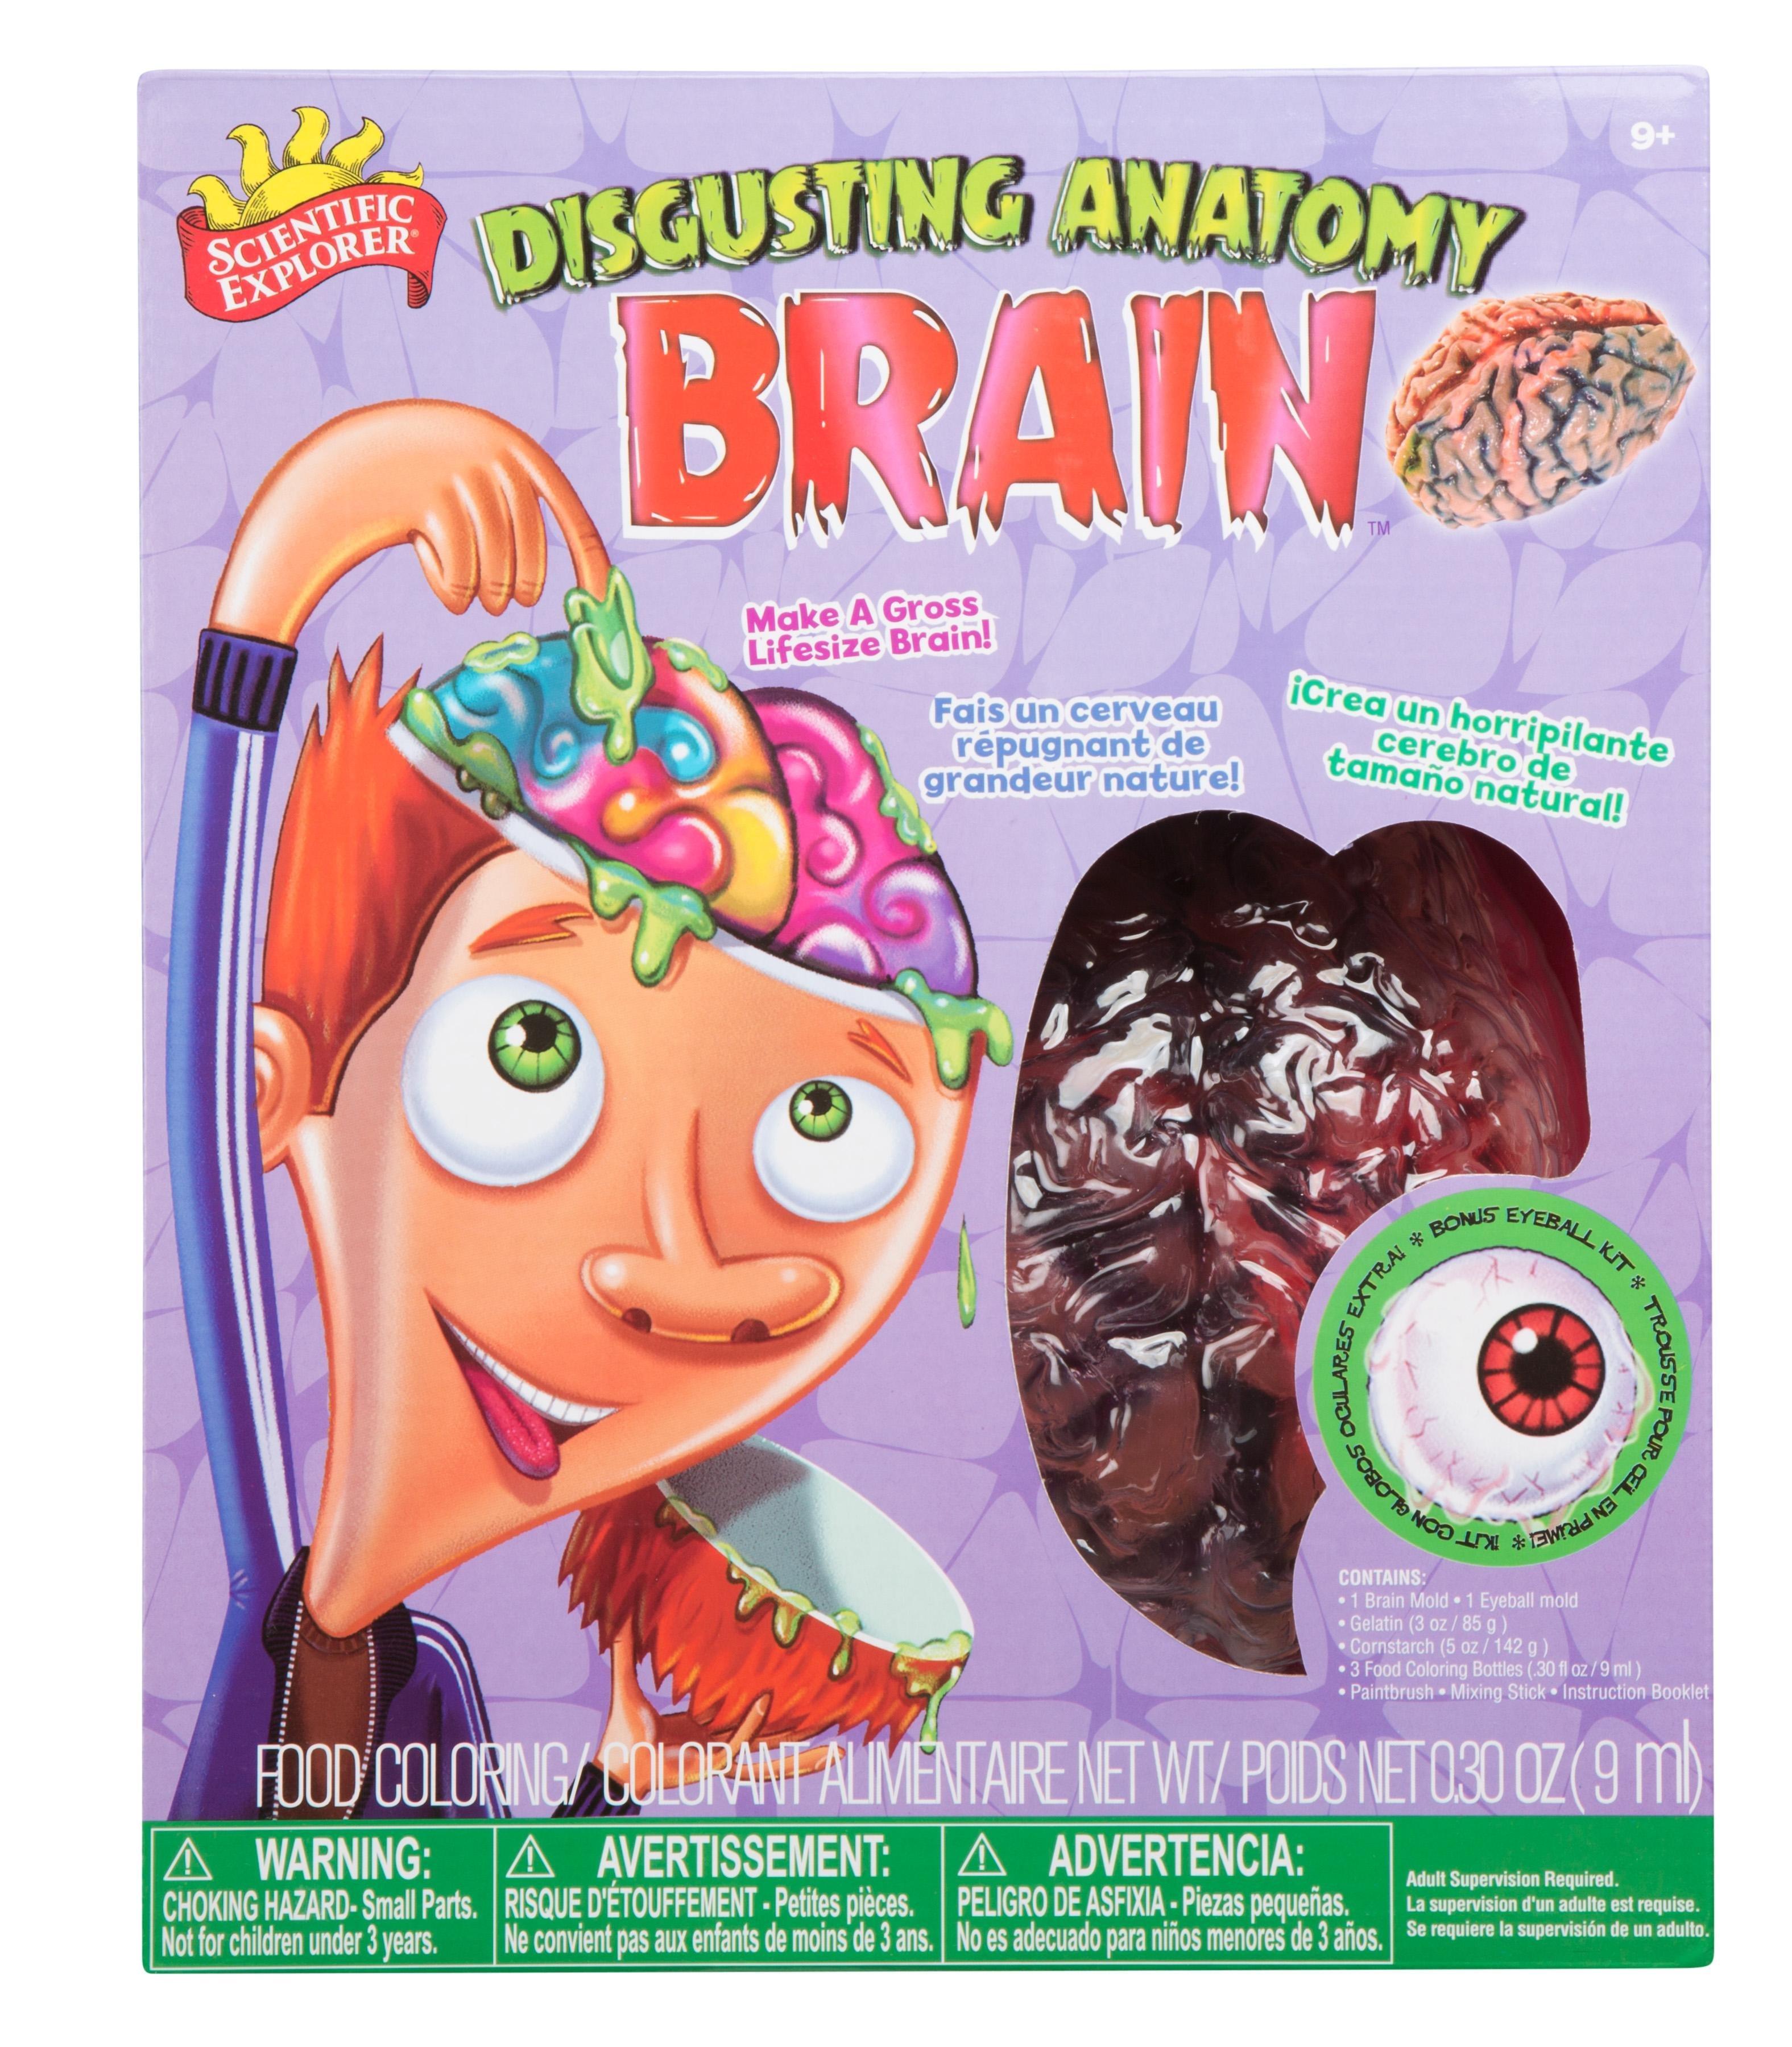 Amazon.com: Scientific Explorer Disgusting Anatomy Brain: Toys & Games